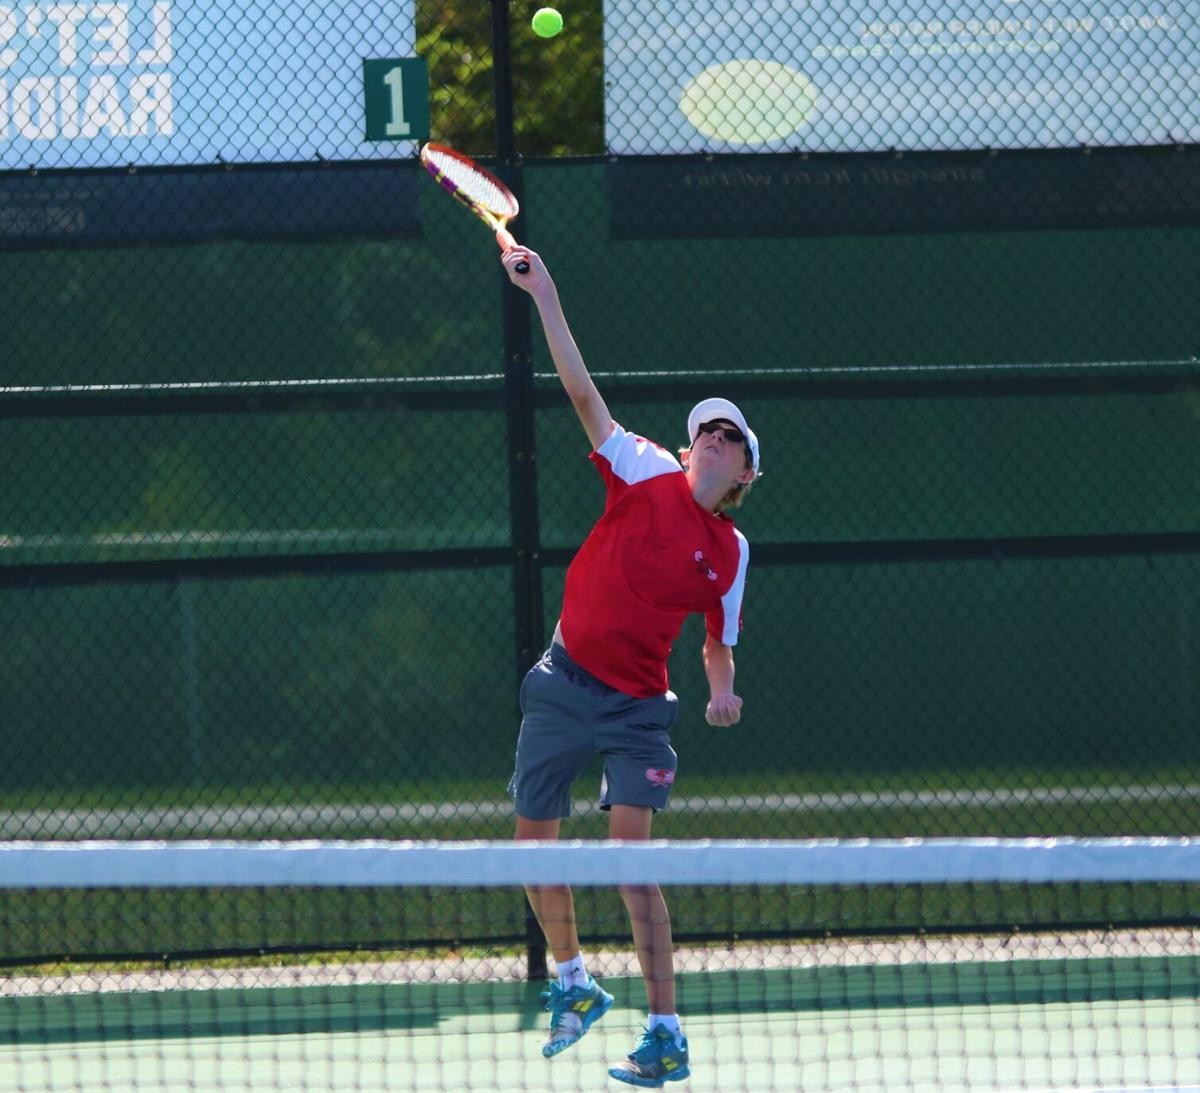 Isaac Stahly Gohen NLC boys tennis tourney 9 25 2021.JPG